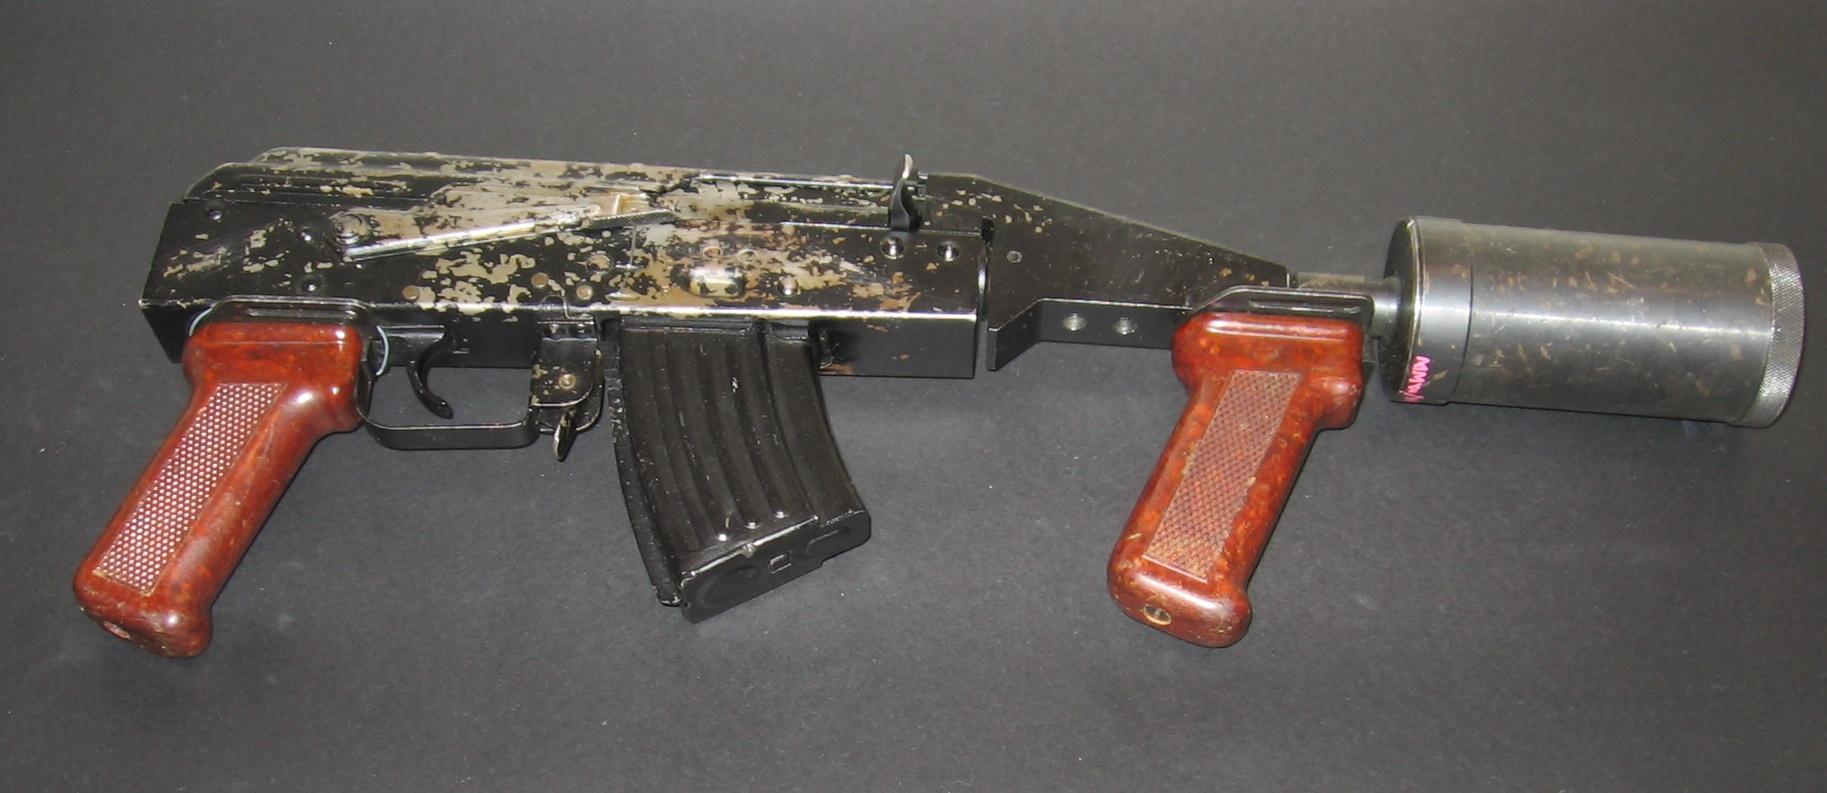 loading image for Kalashnikov grenade launcher